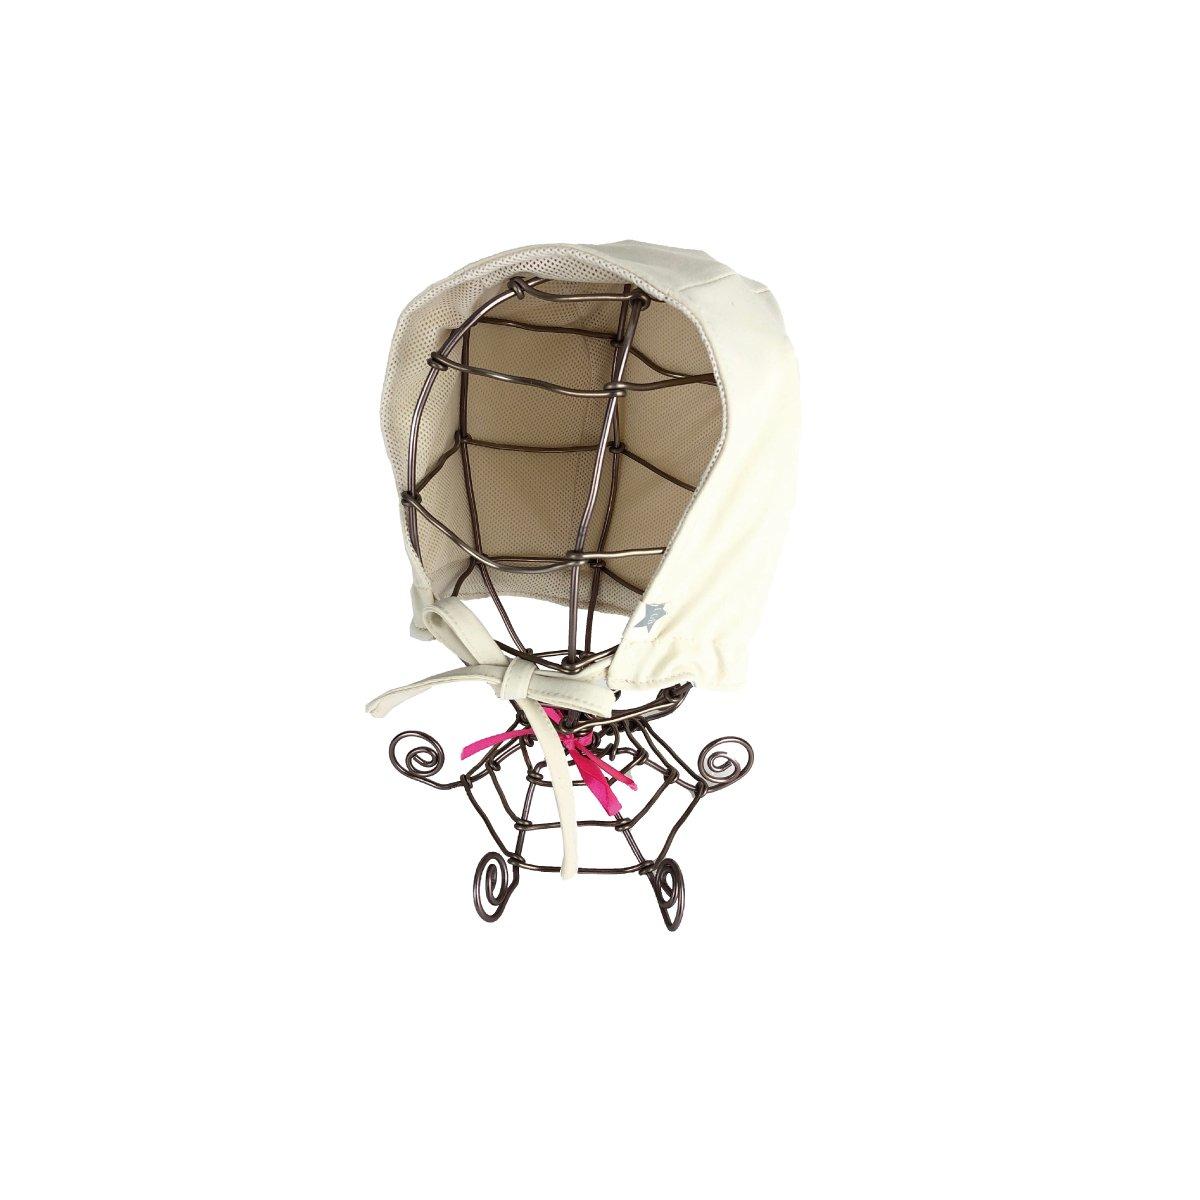 【BABY】Candy Bonnet 詳細画像7